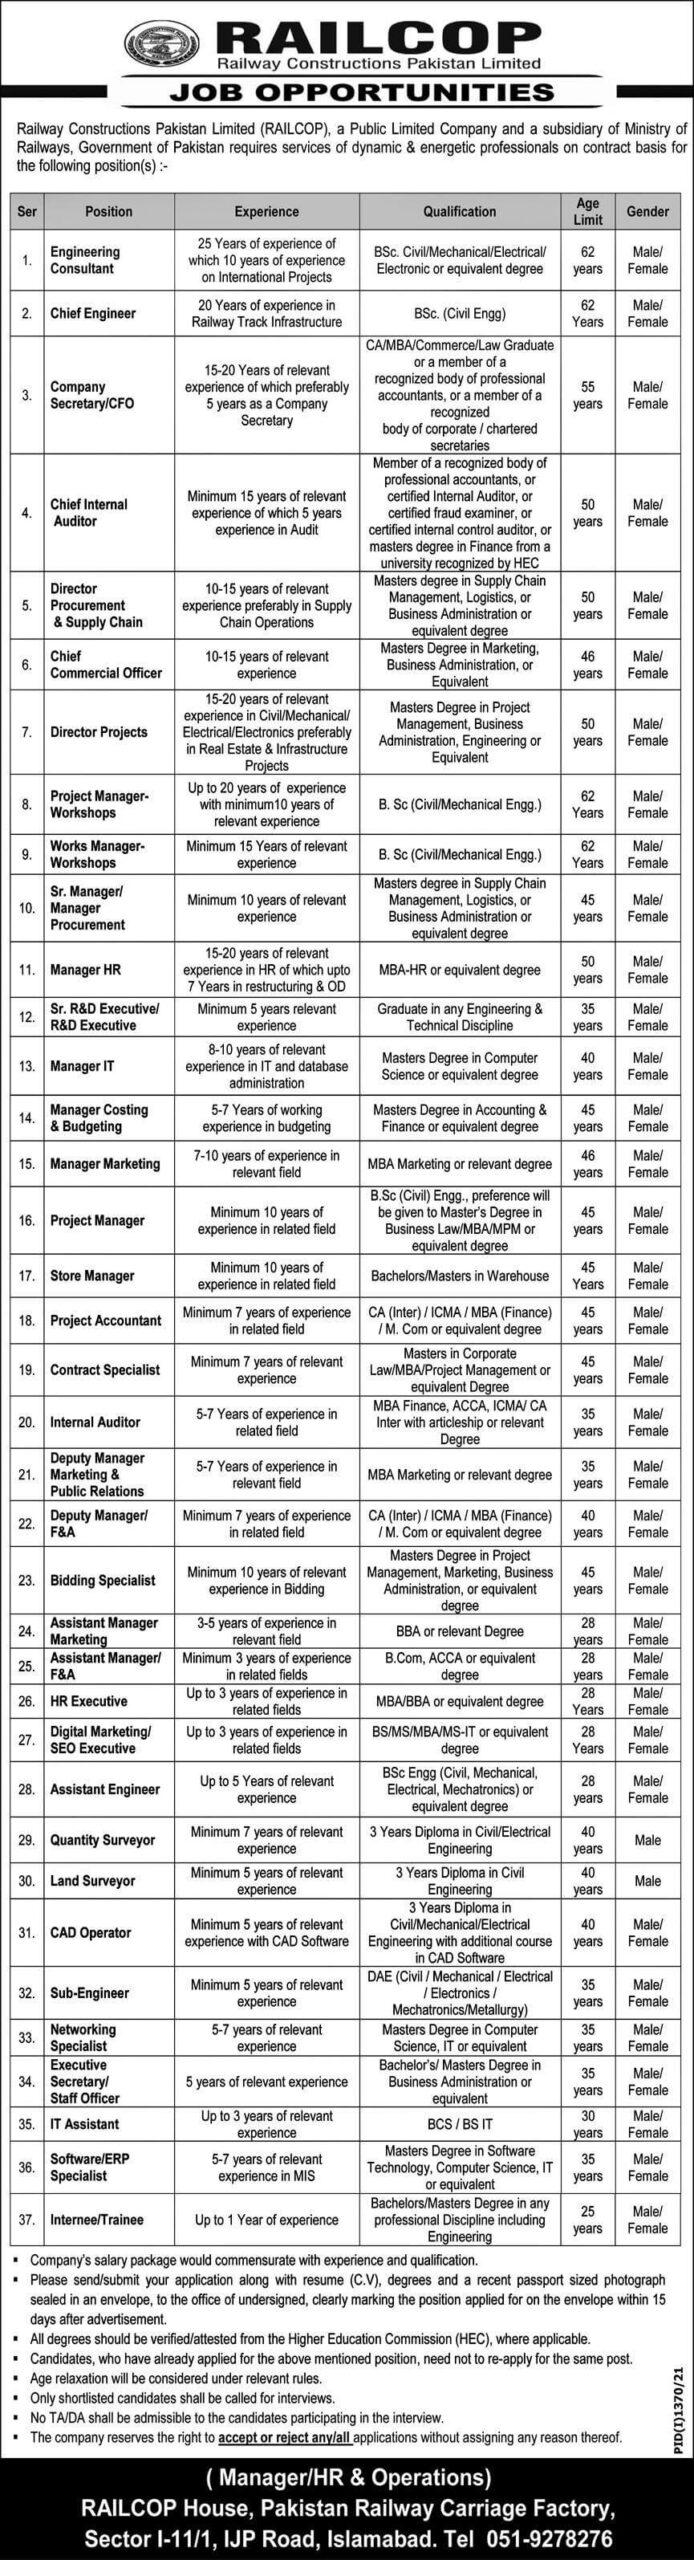 Pakistan Railways Jobs 2021 Matric Base At Ministry of Railways Railcop